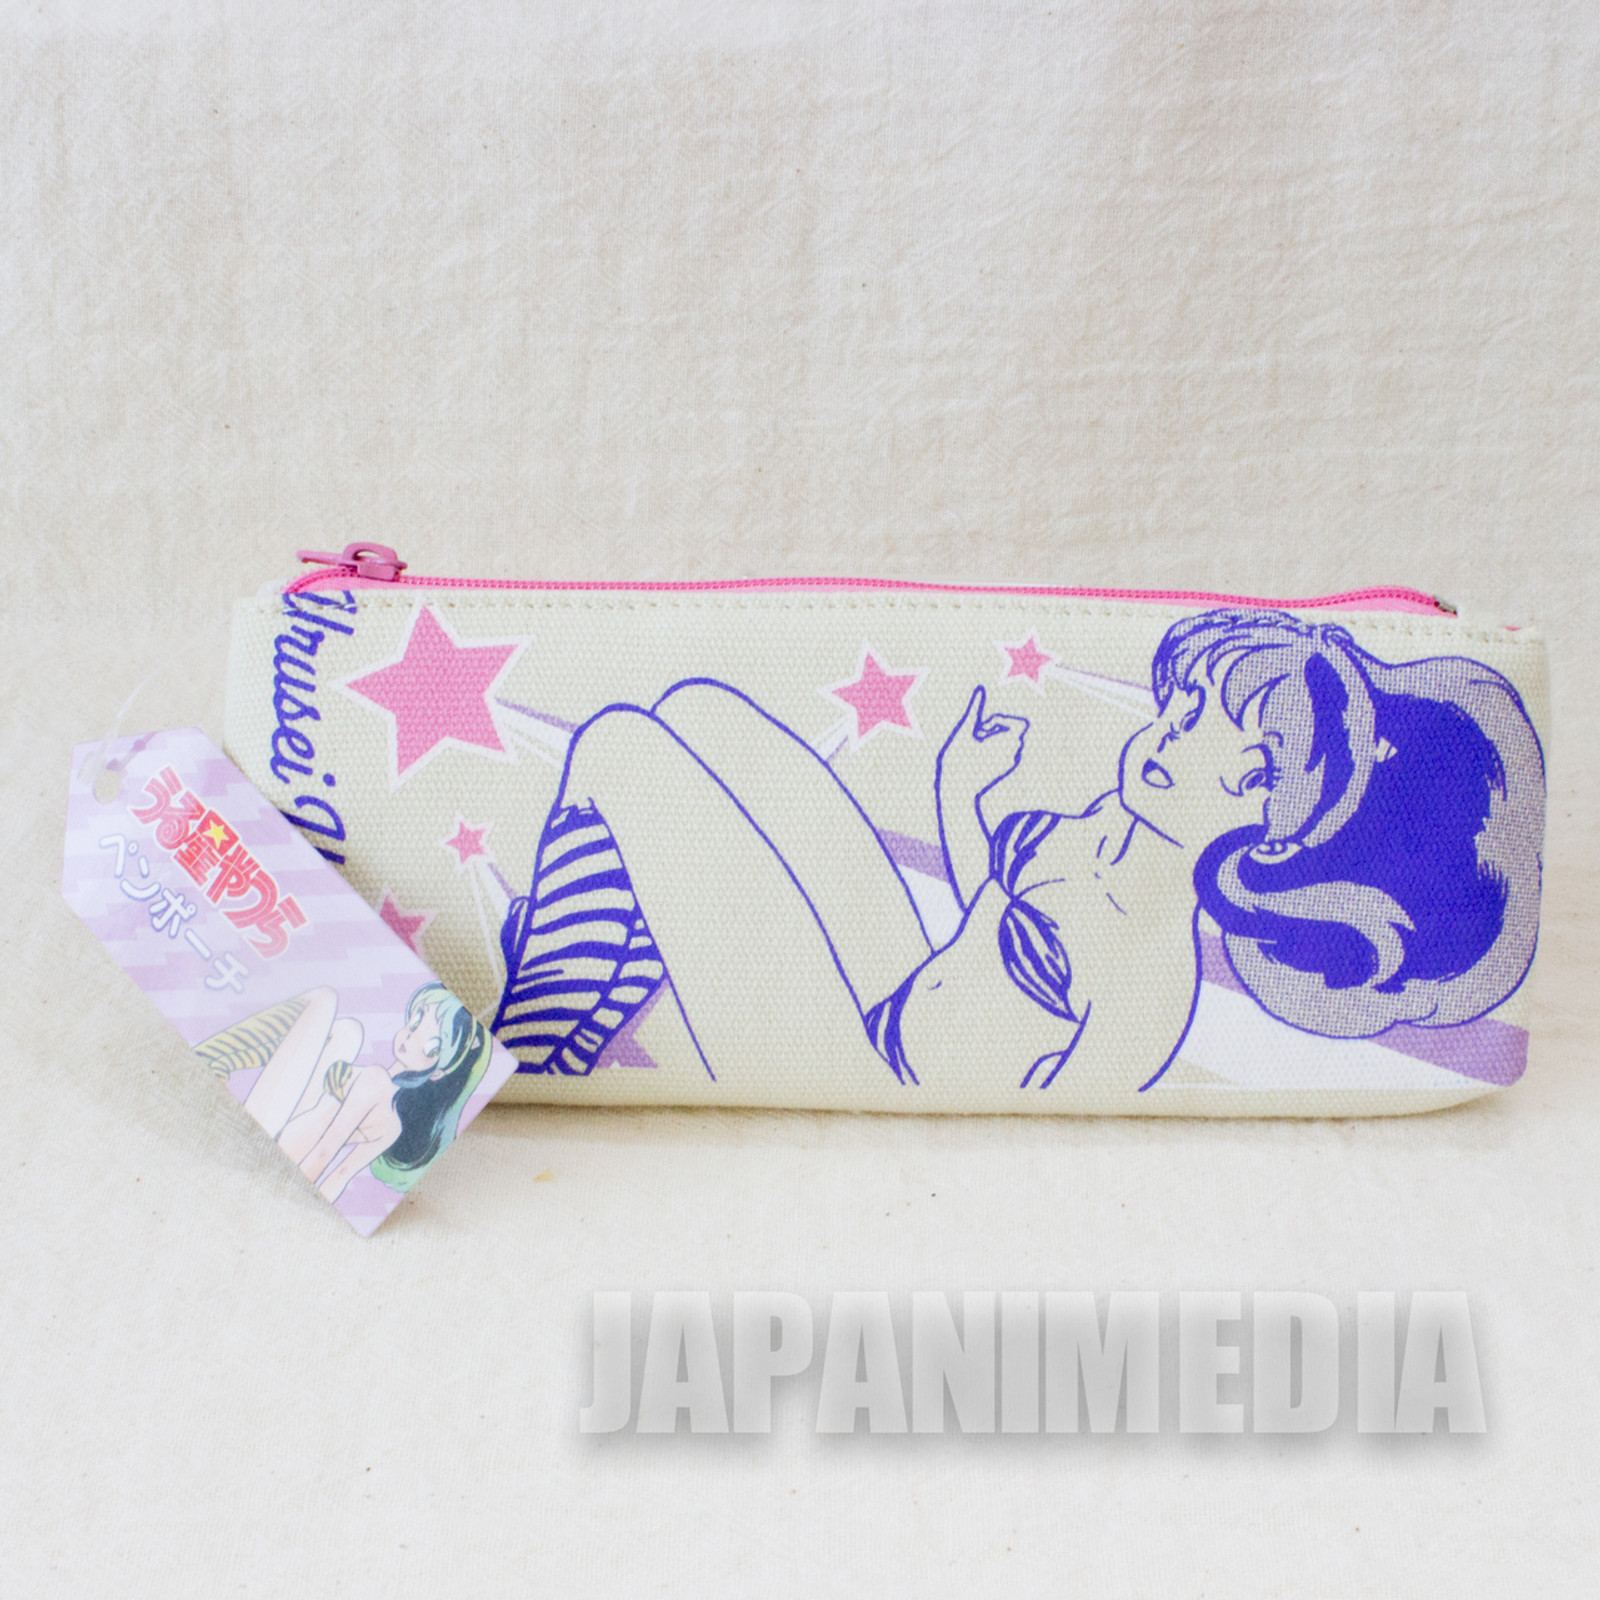 Urusei Yatsura LUM Pen Case Pouch Bag KD System JAPAN ANIME MANGA